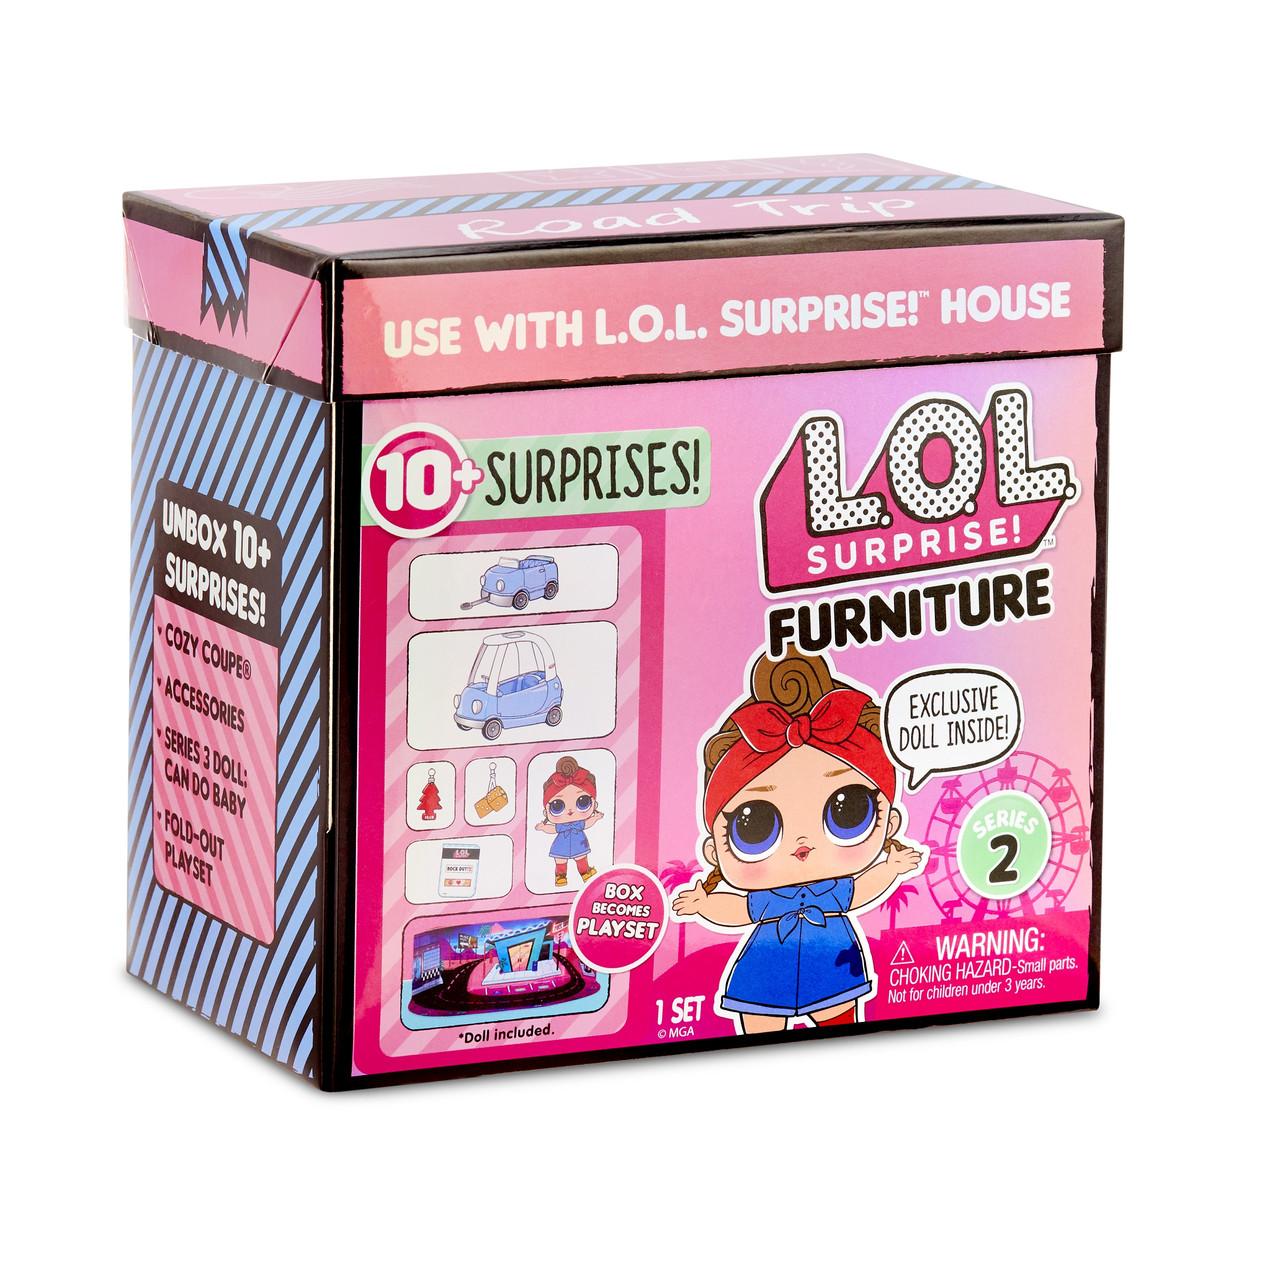 L.O.L. Surprise! Игровой набор Автопутешествие с машинкой  Furniture Road Trip with Can Do Baby